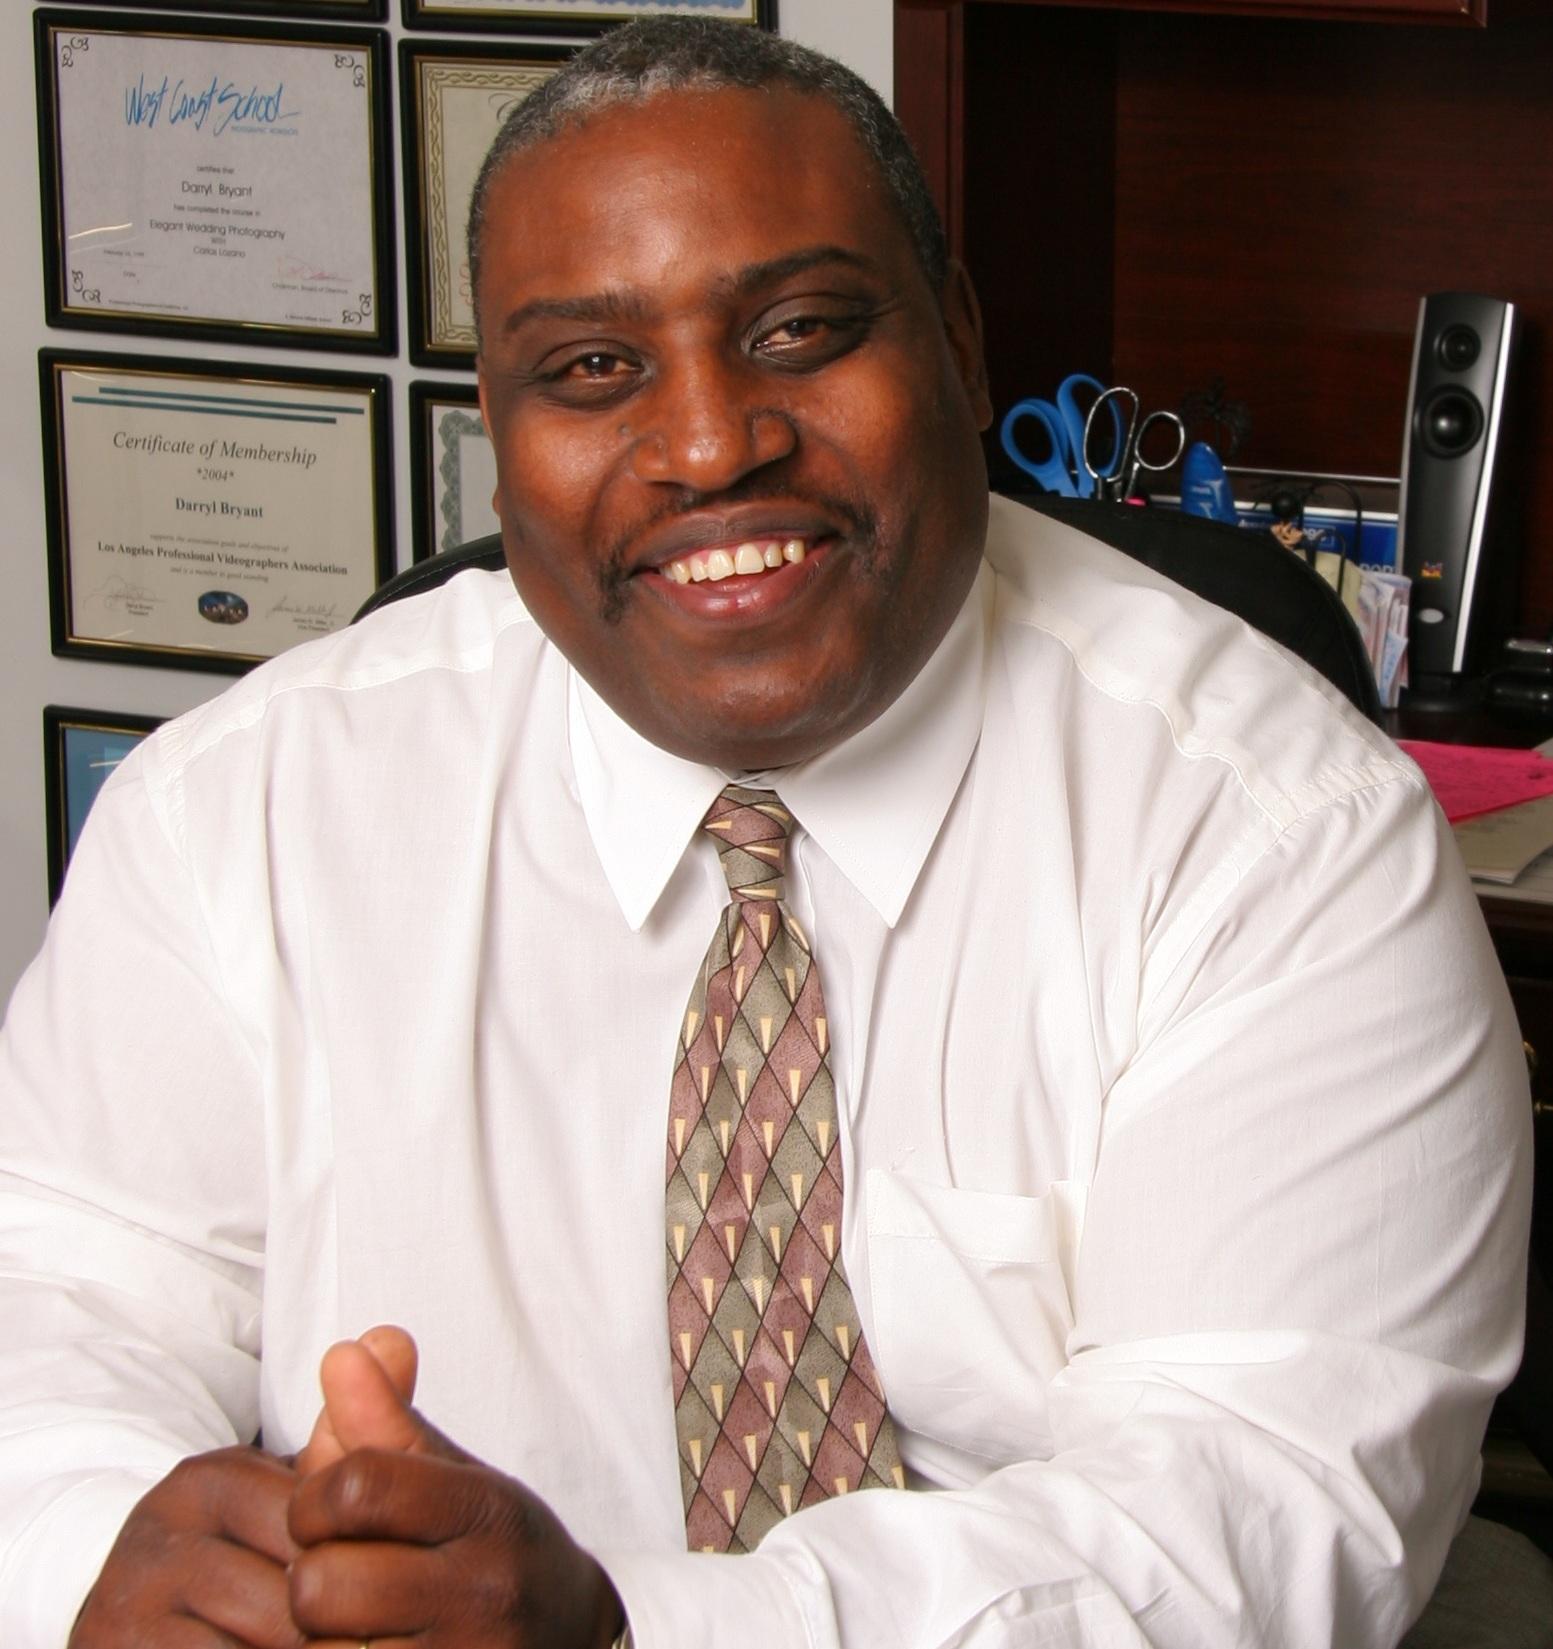 Darryl Bryant, Business Motivator